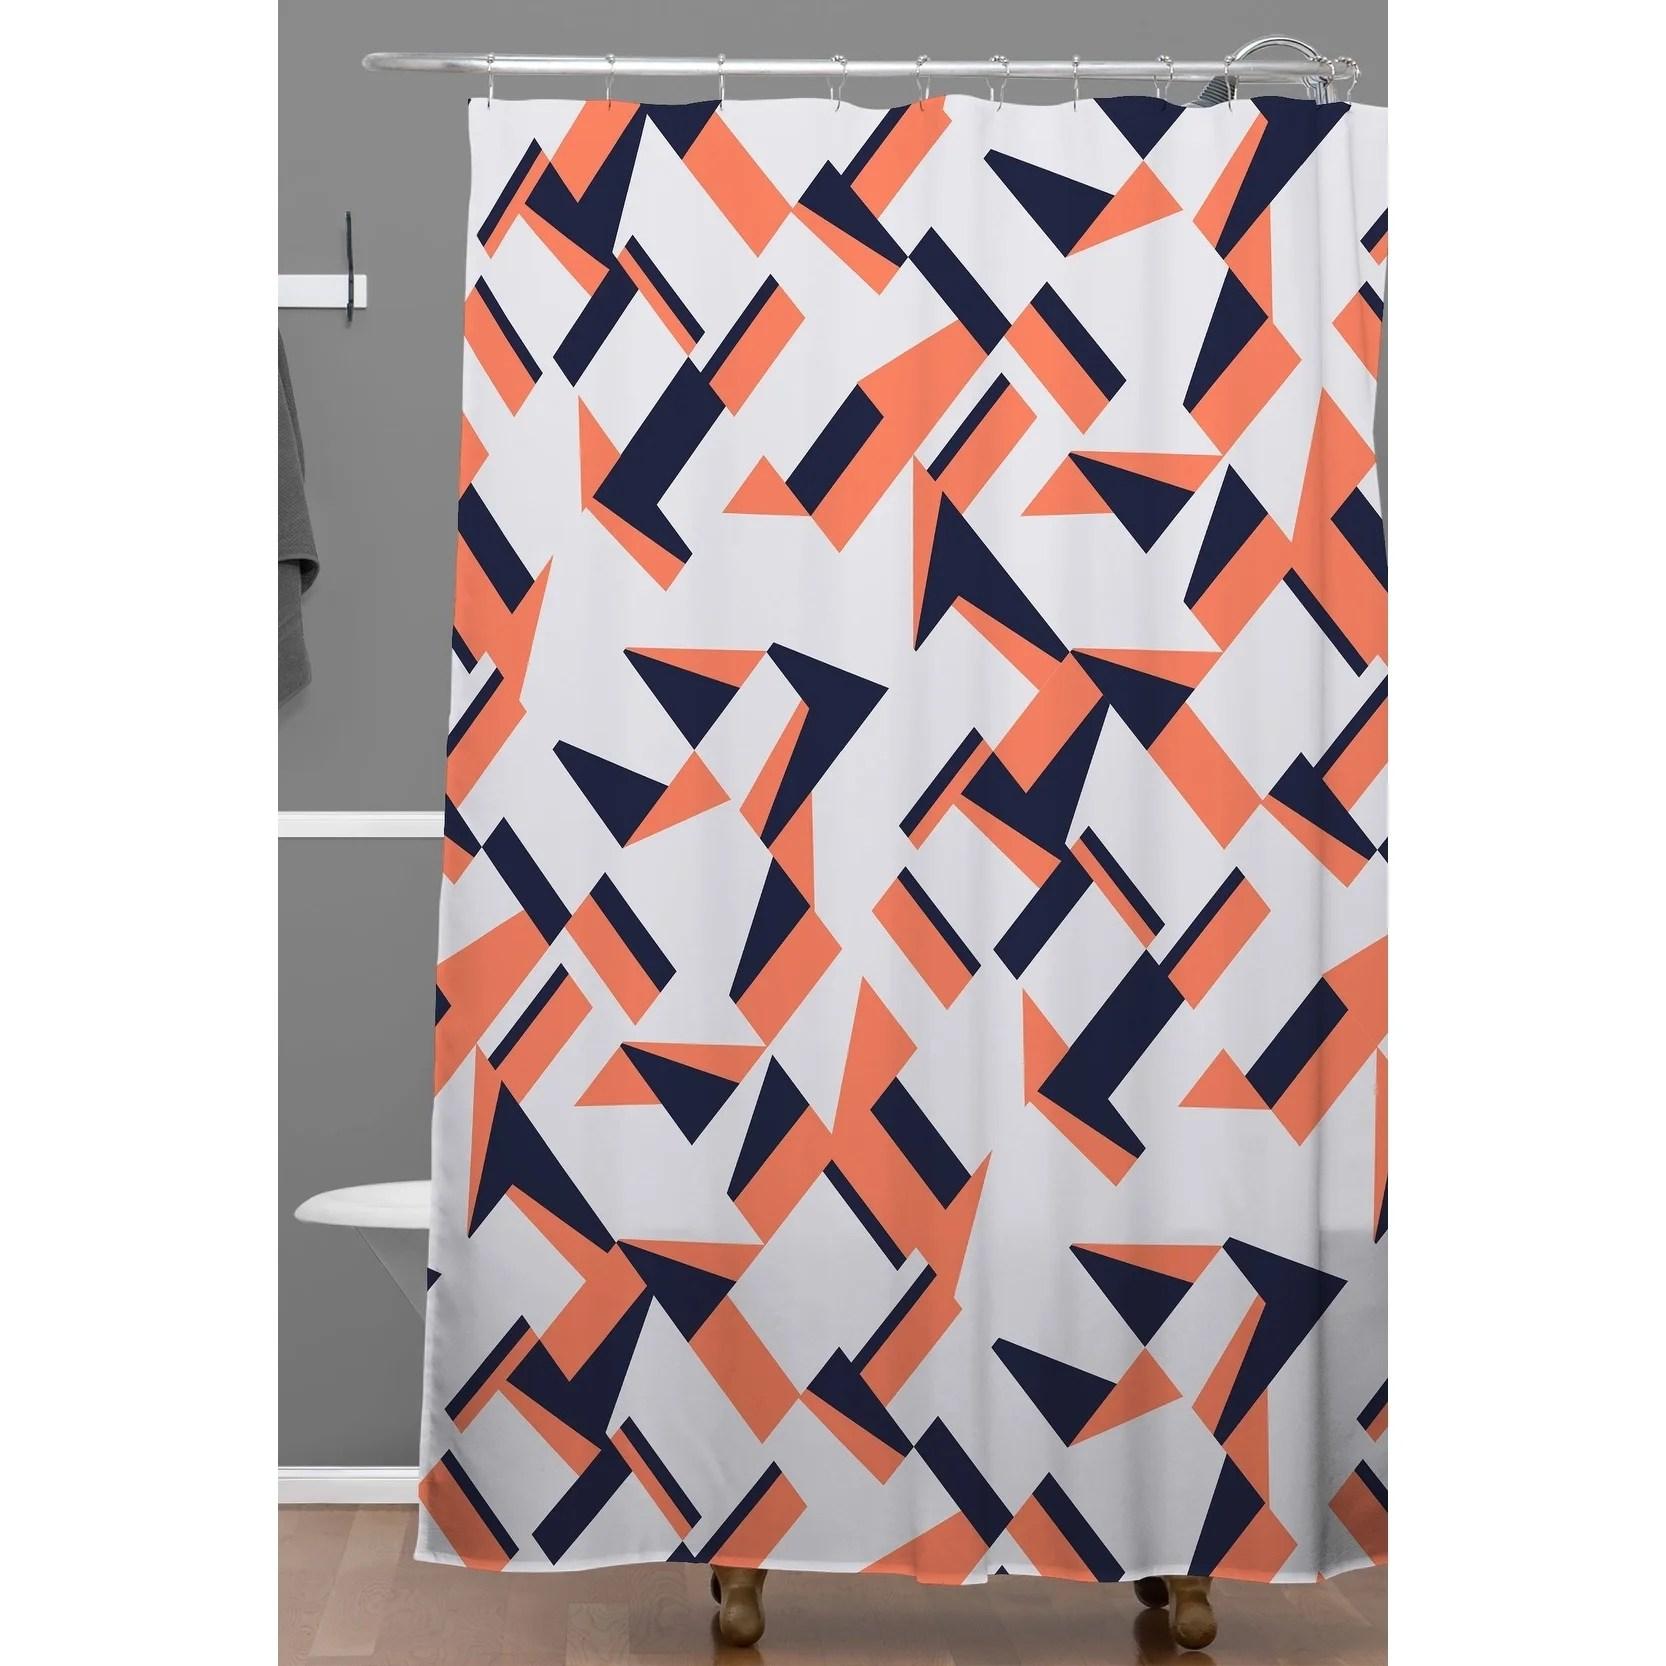 deny designs modern tile geometric shower curtain